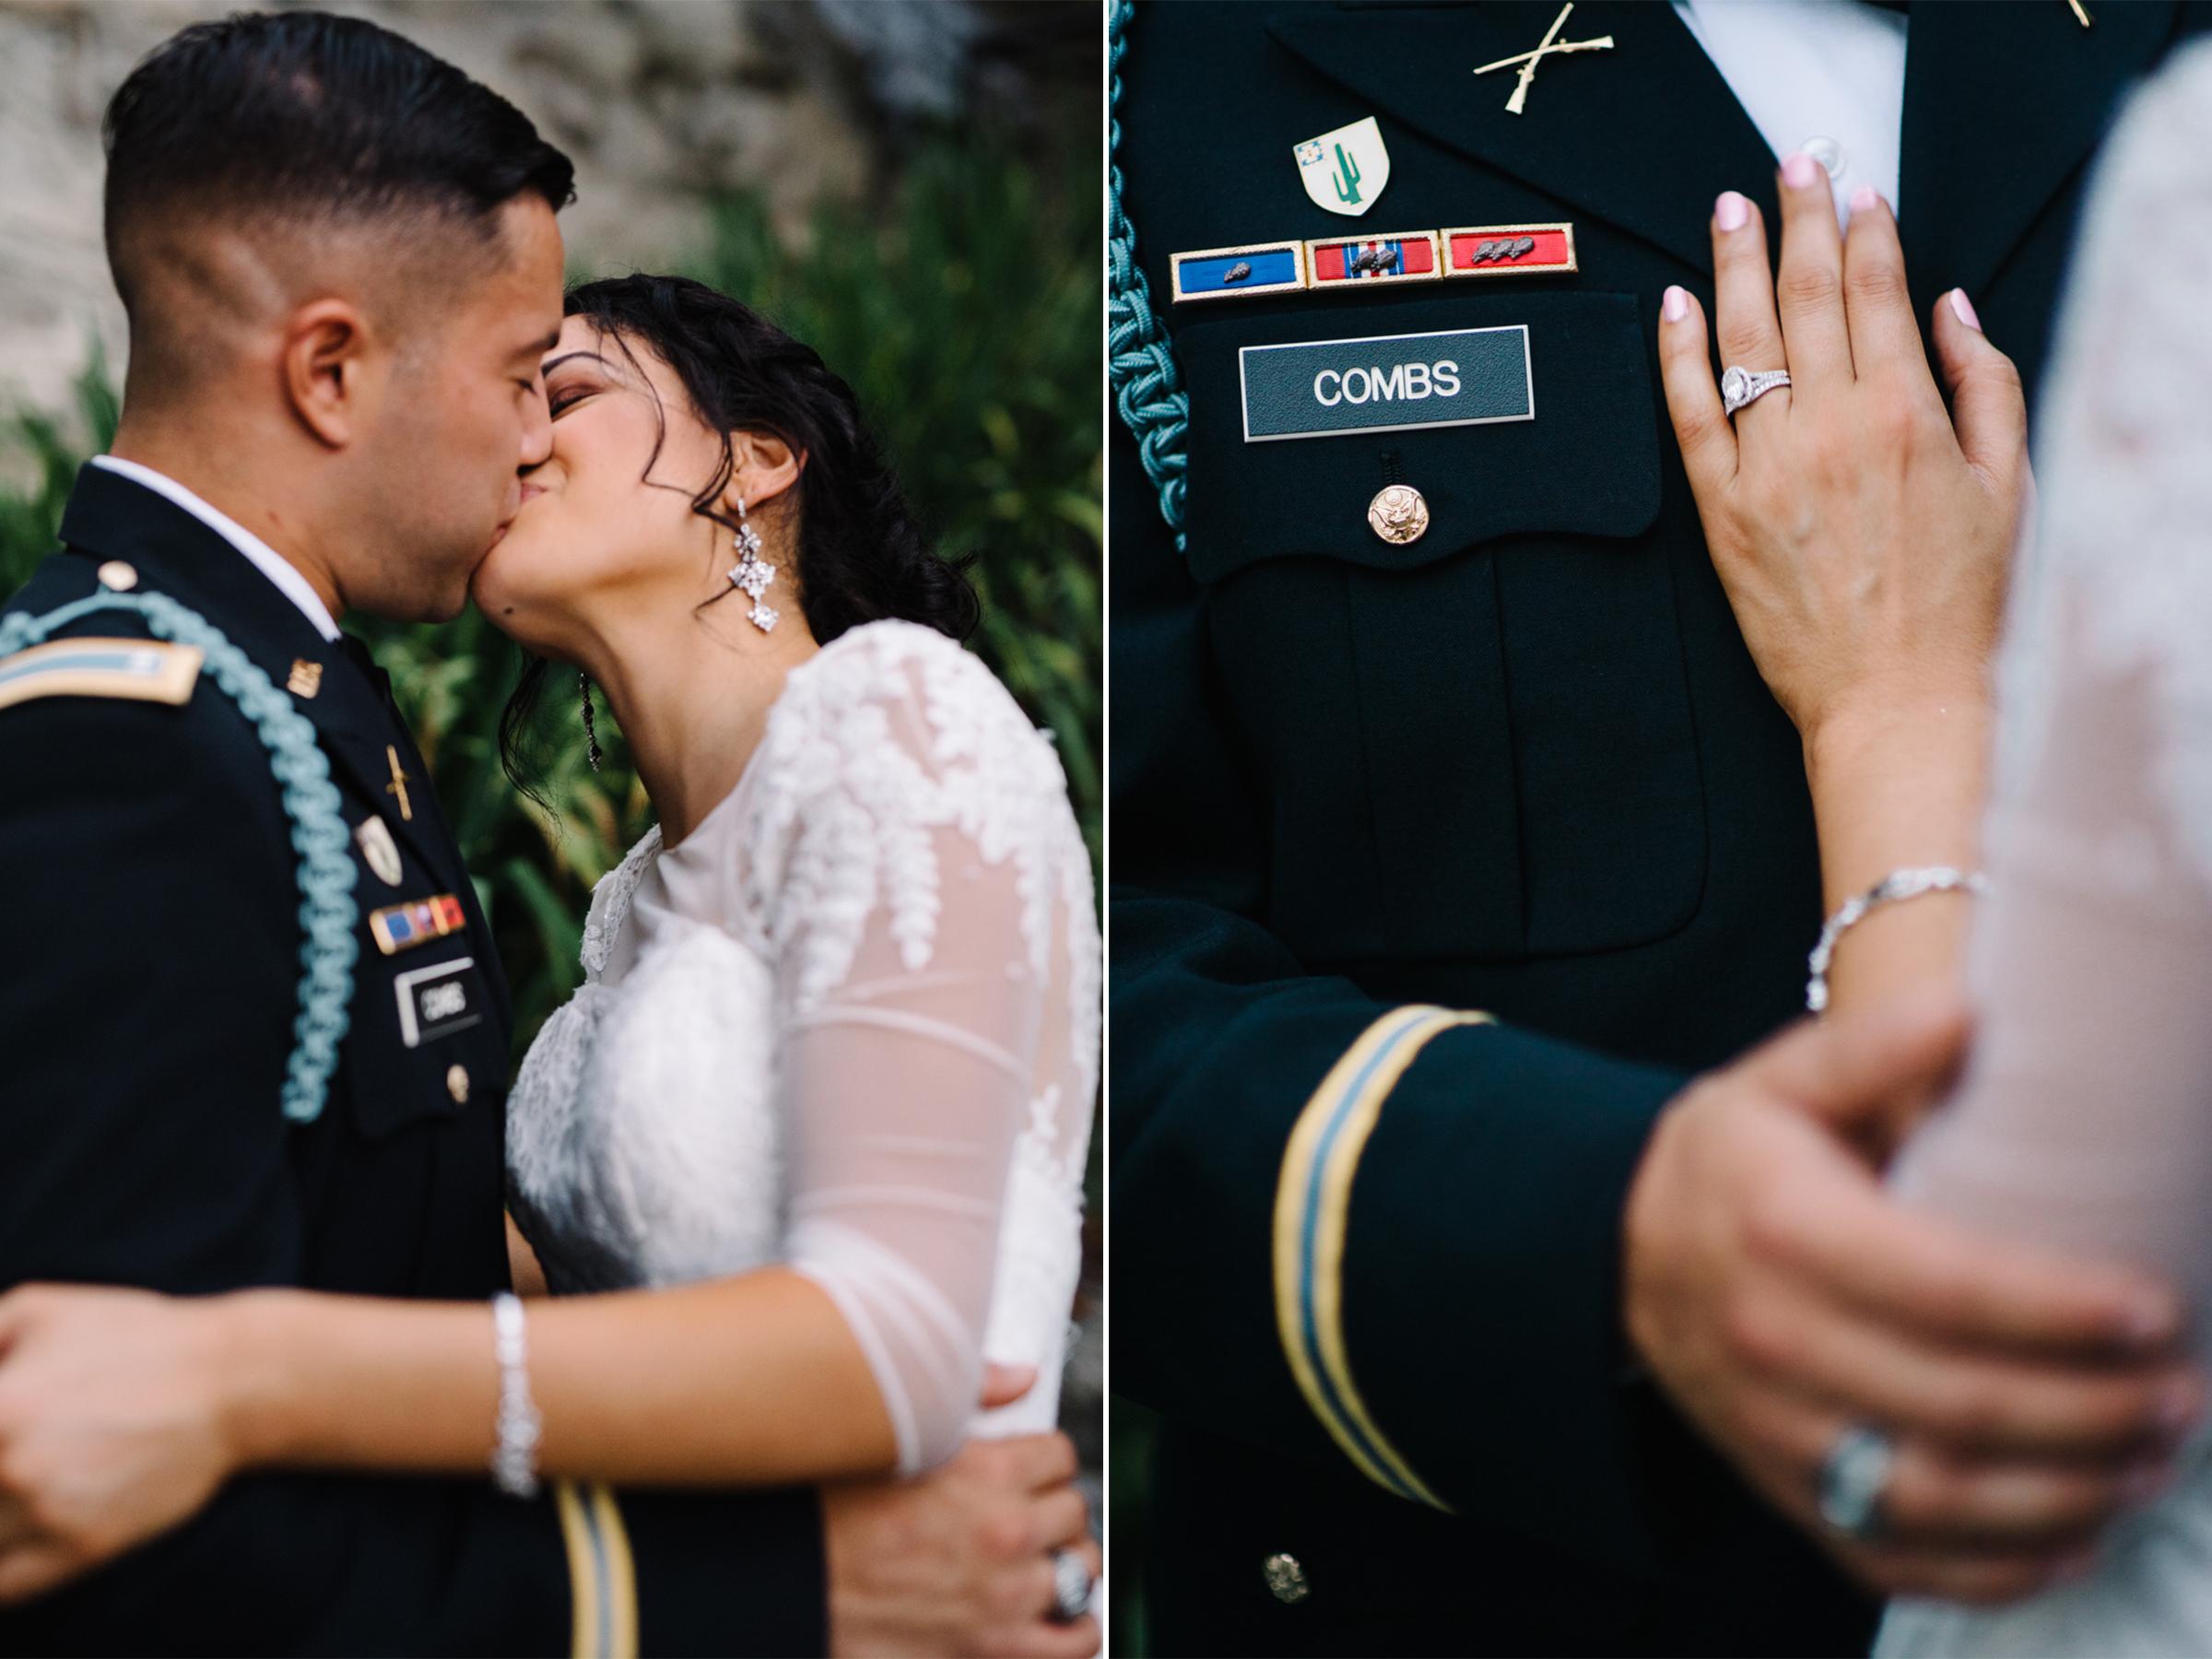 Military Wedding- West Point Army Academy-Bride and Groom Portrait-Army Jacket- Olivia Christina Photo.jpg